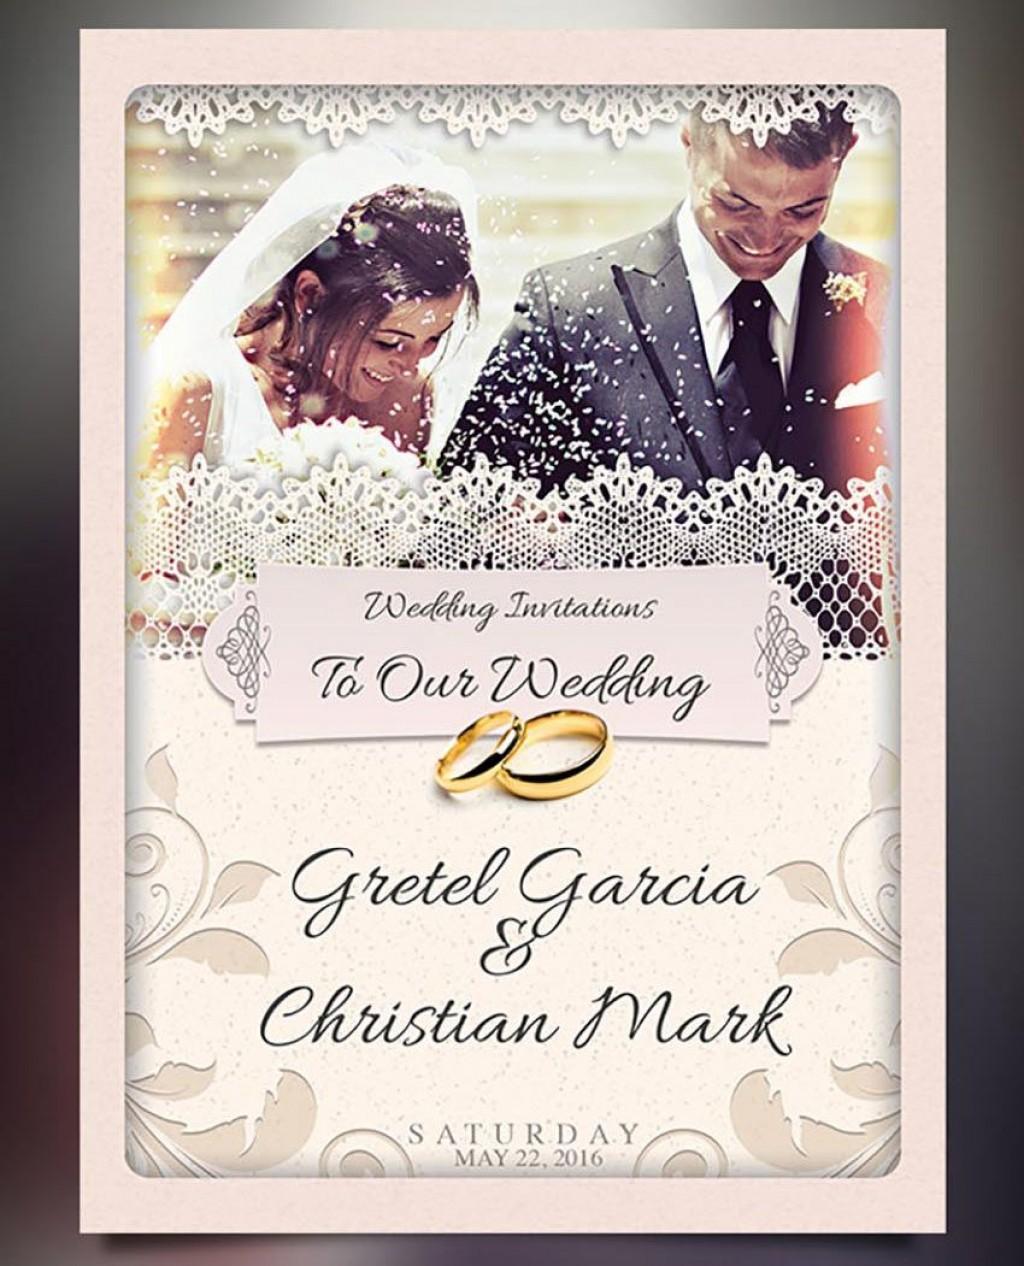 008 Incredible Photoshop Wedding Invitation Template Image  Templates Hindu Psd Free Download CardLarge